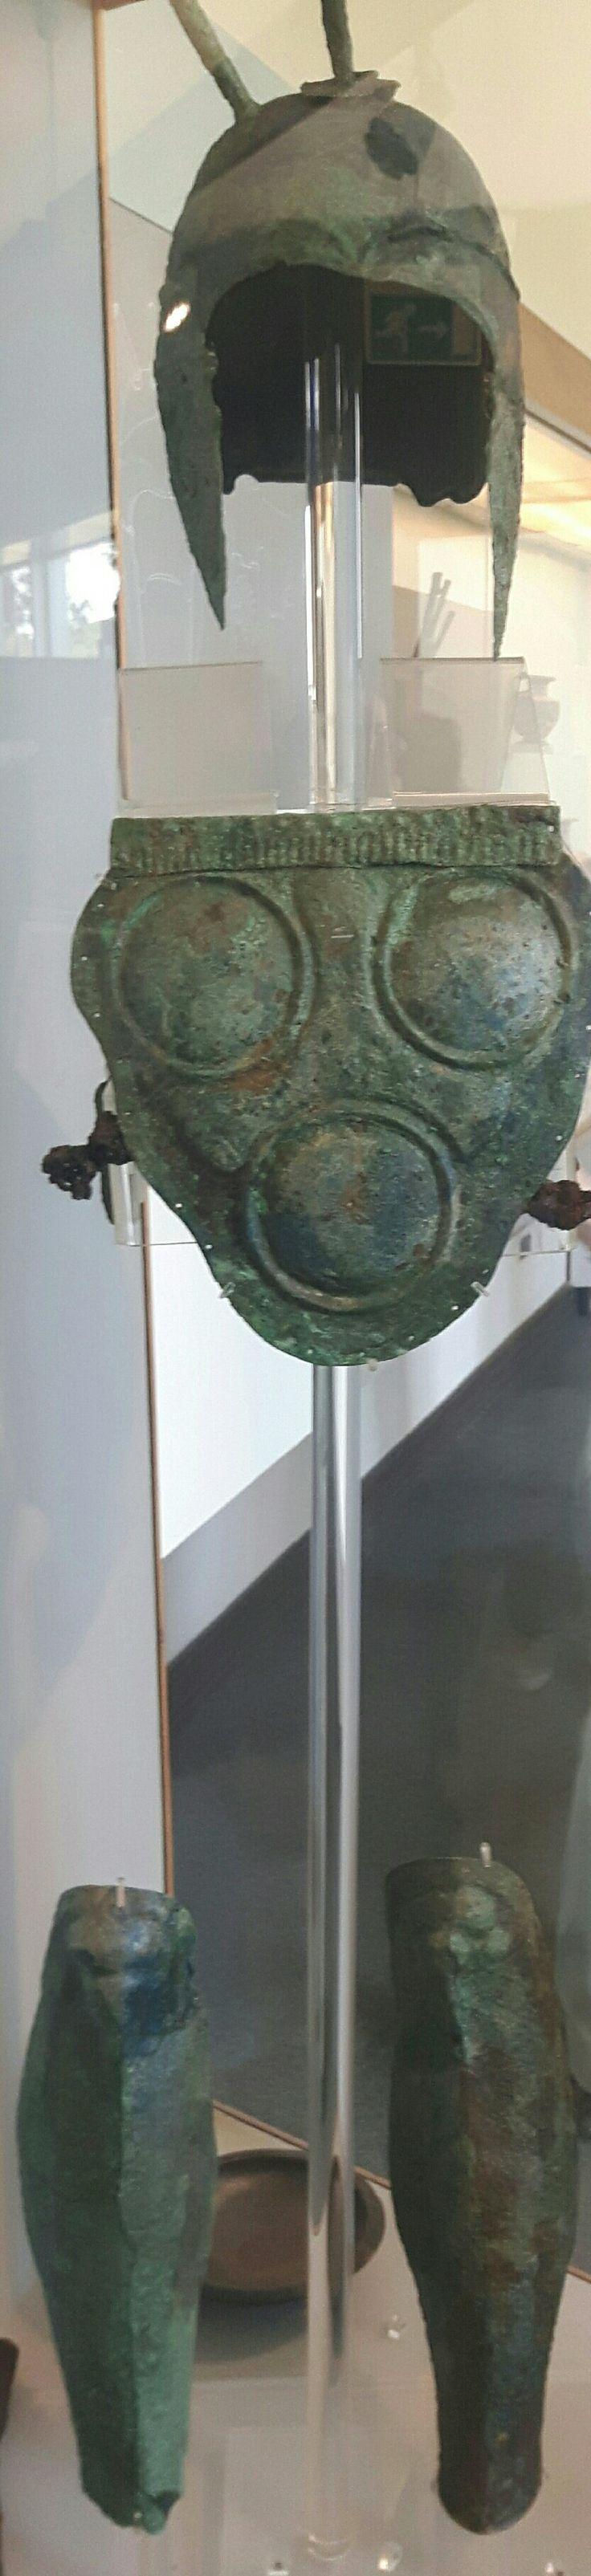 Paestum. Armatura di guerriero Lucano, parte di corredo funebre. 380-370 a.C.